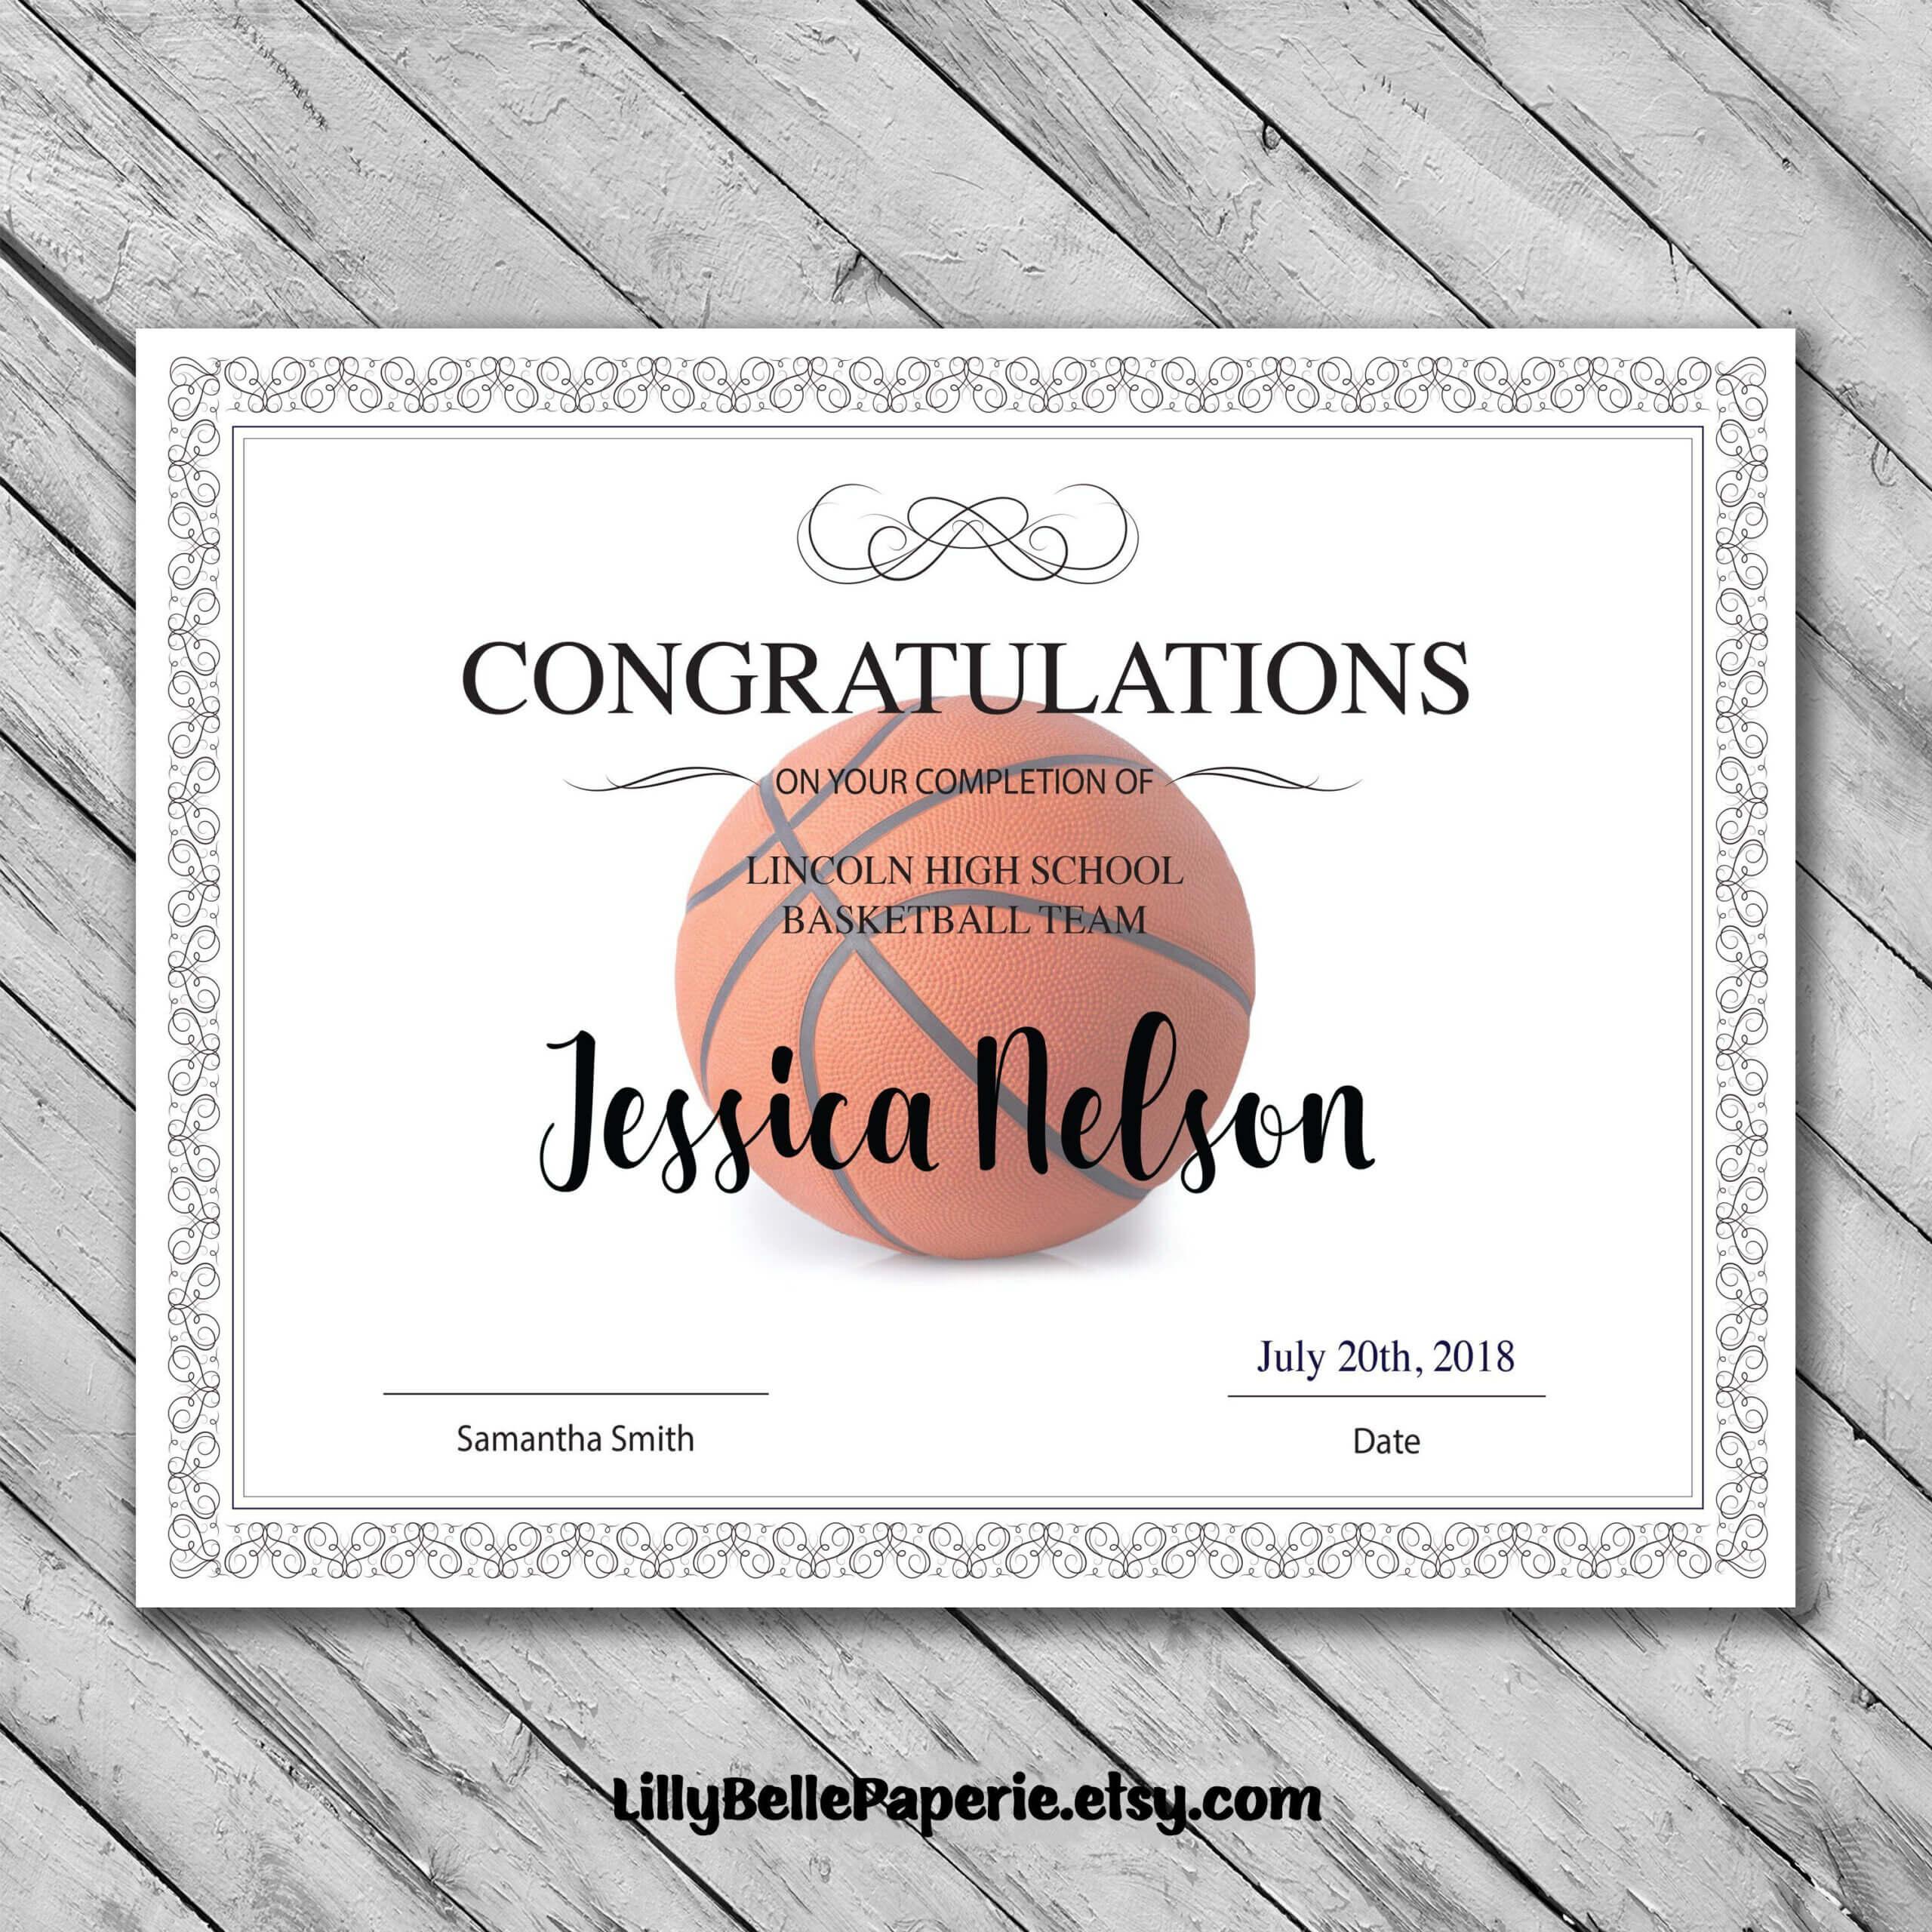 Editable Basketball Certificate Template - Printable With Regard To Basketball Certificate Template